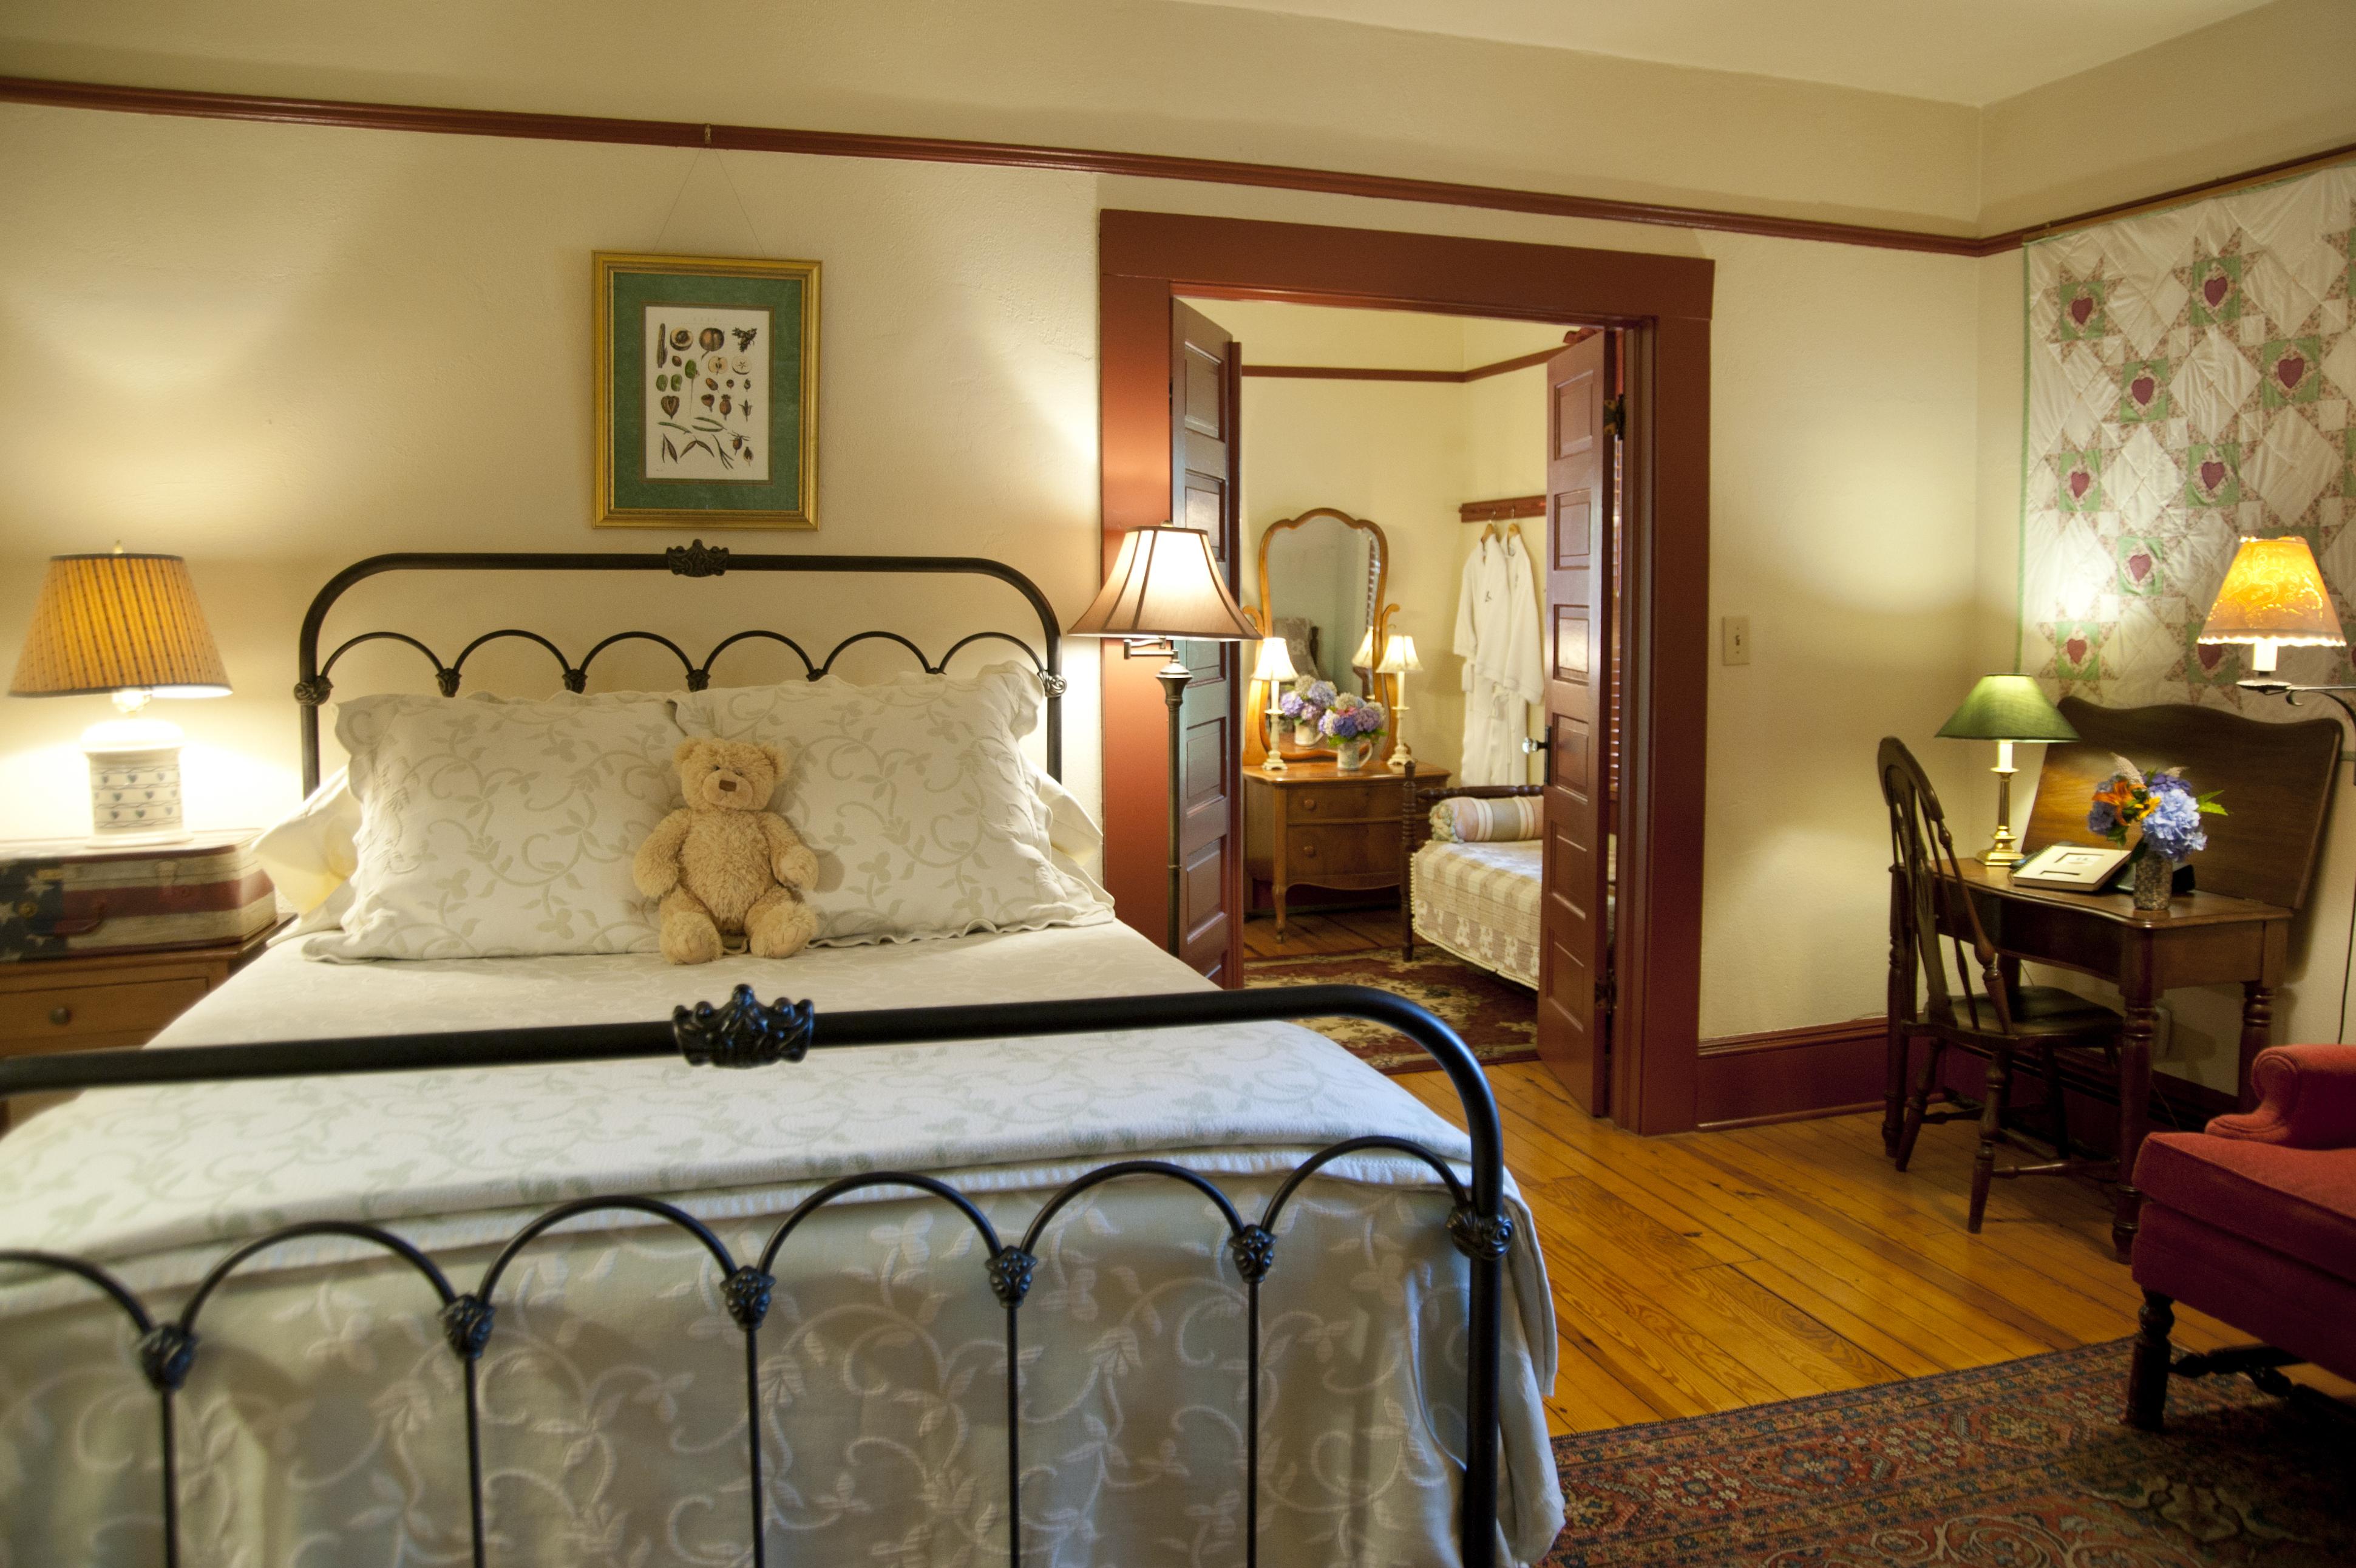 Rabun Suite at Beechwood Inn